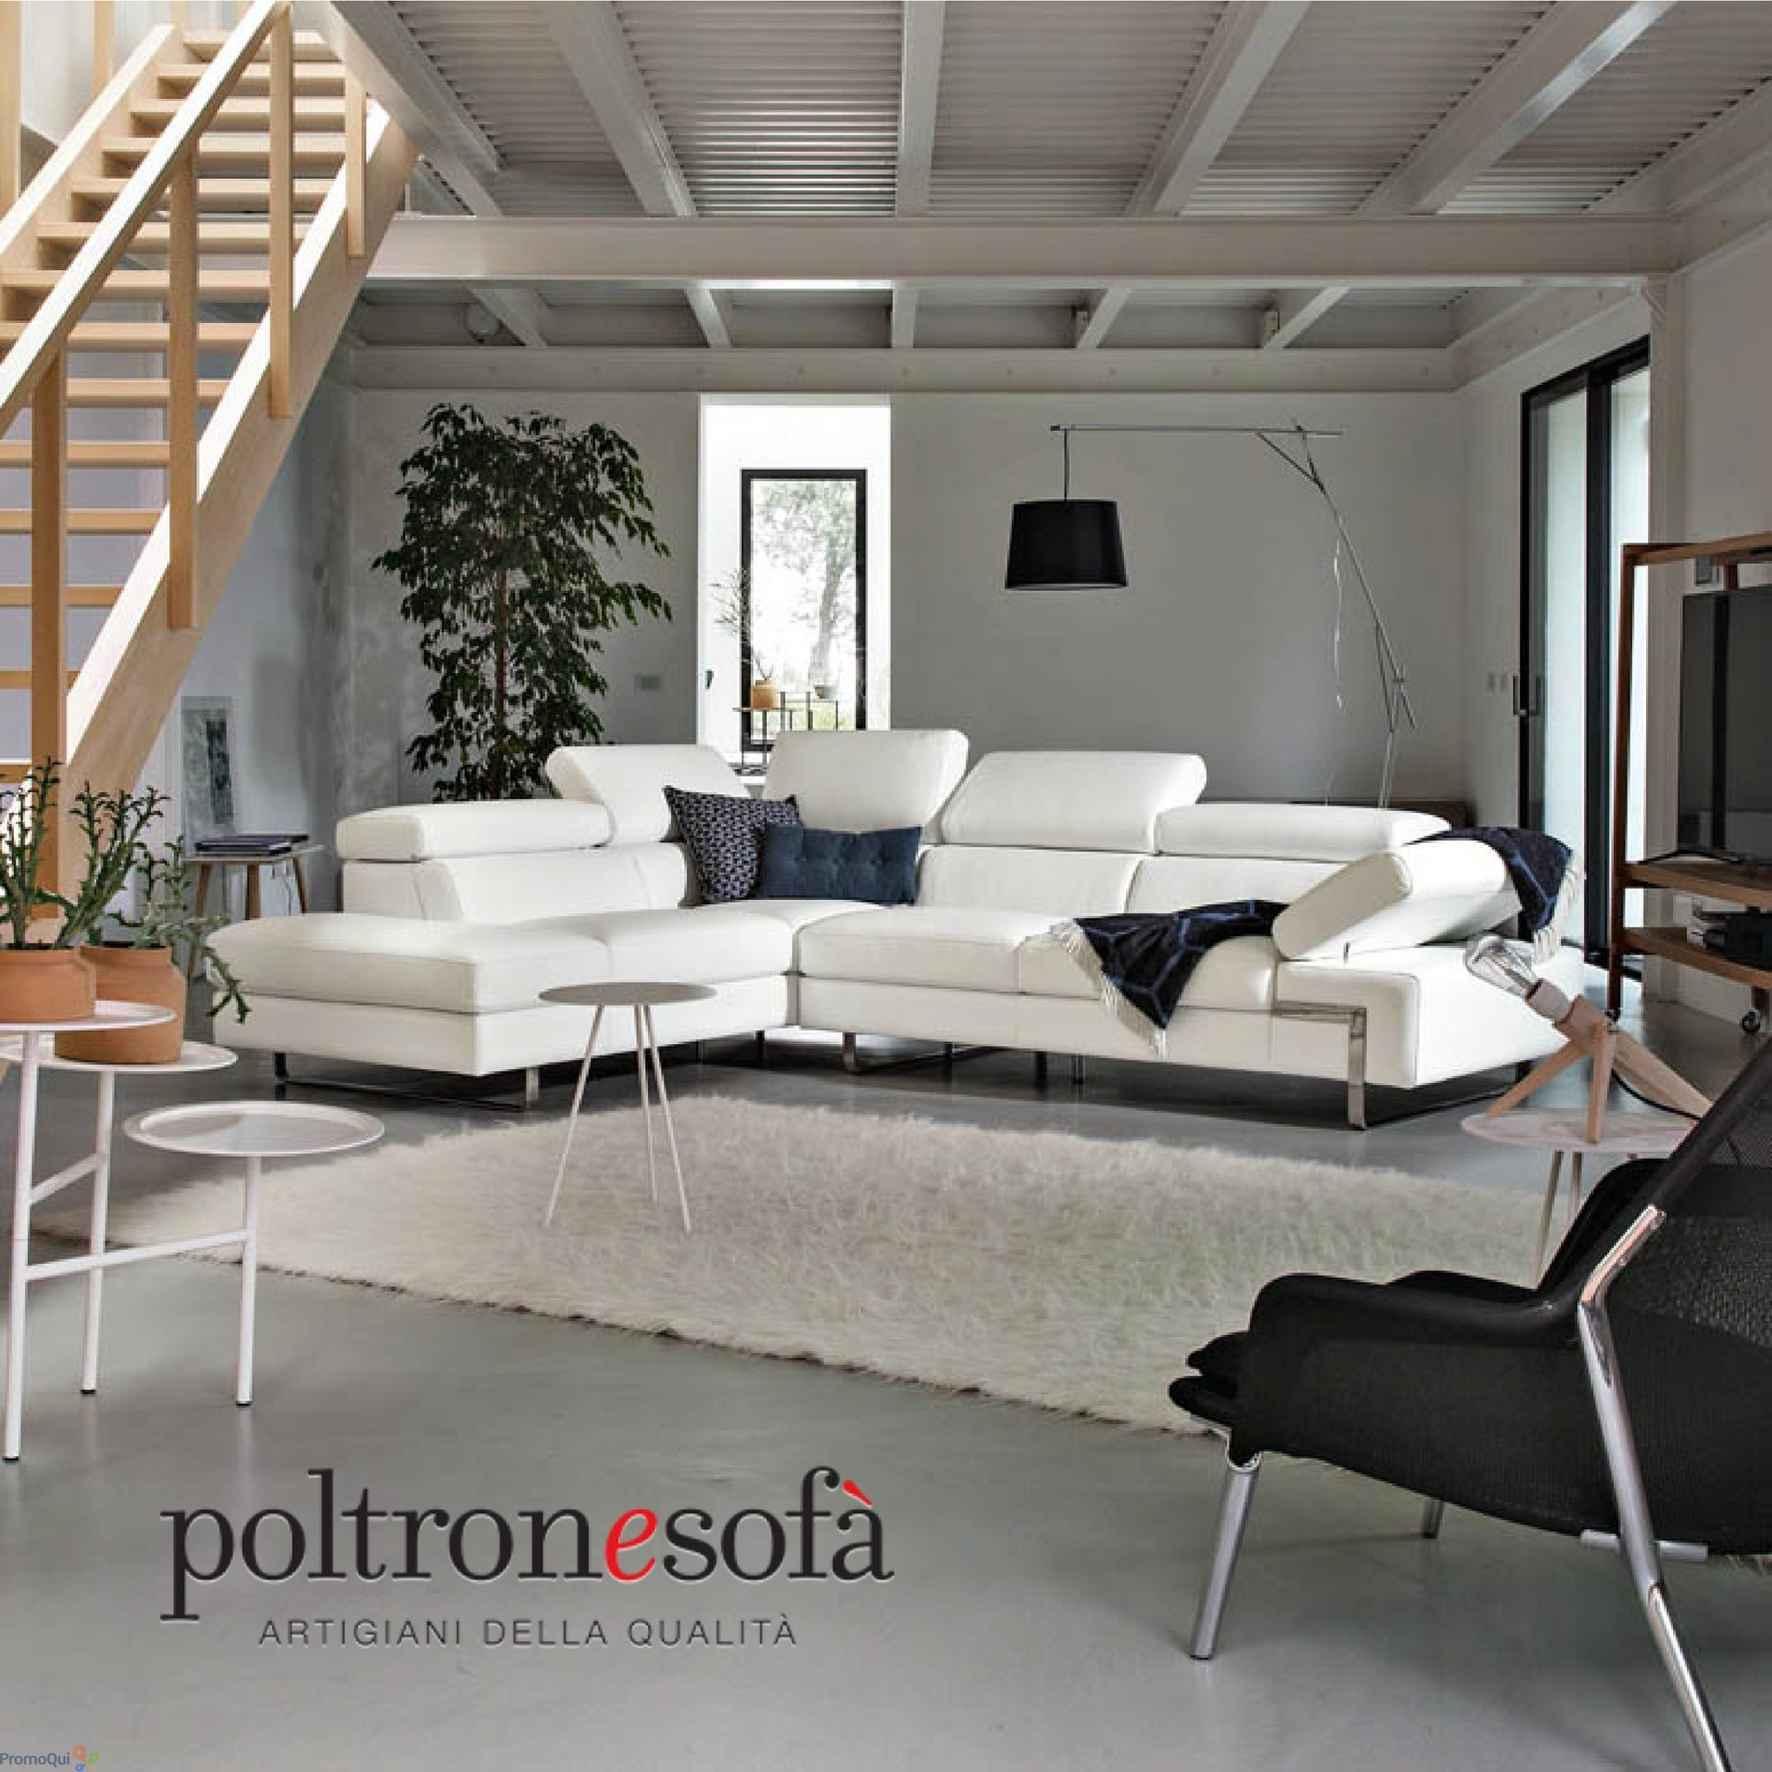 Poltronesofa fashion designs for Home salon trignac